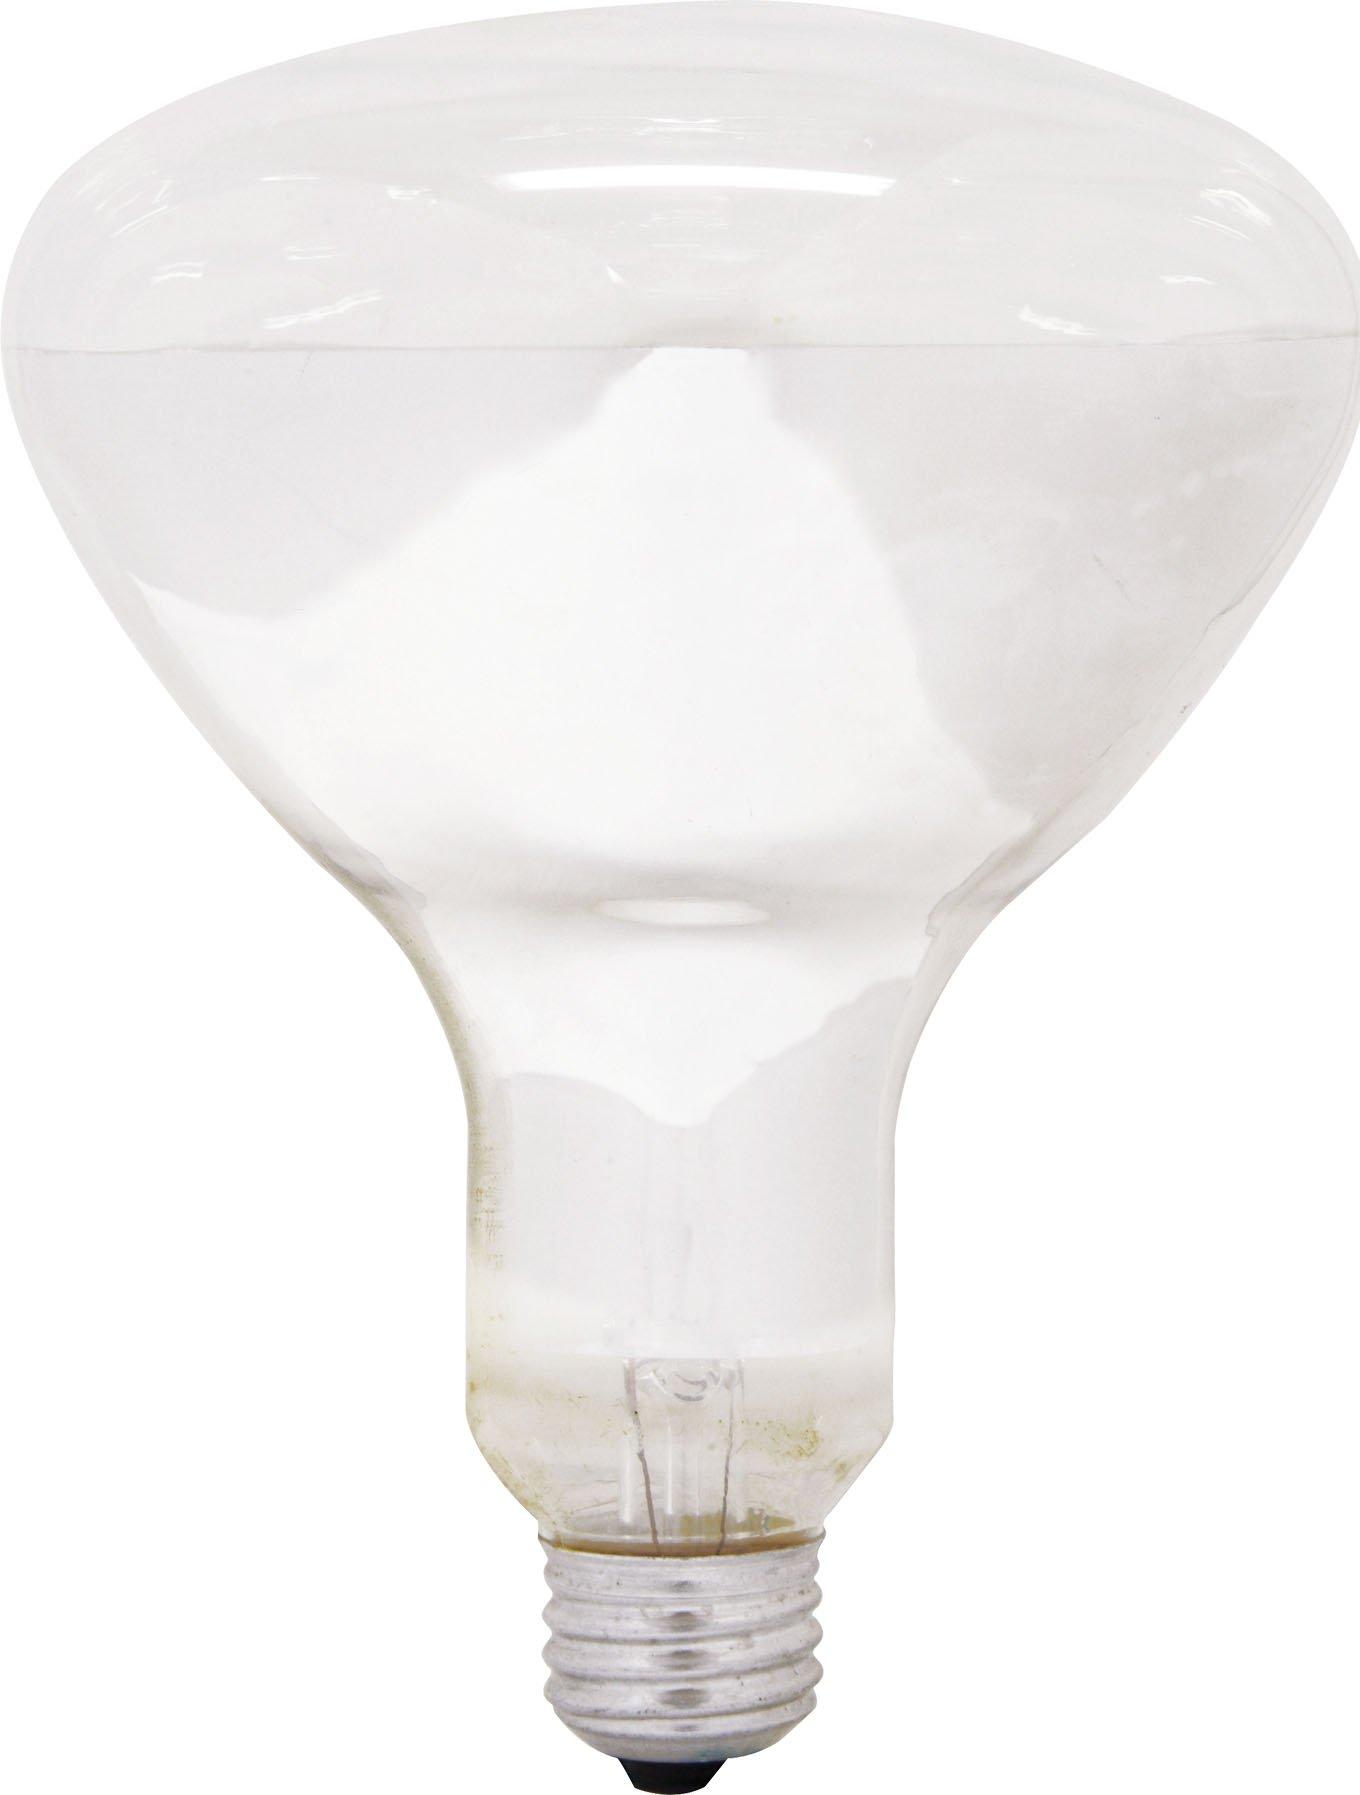 GE Lighting 47724 250-Watt R40 Light Bulb with Medium Base, 6-Pack